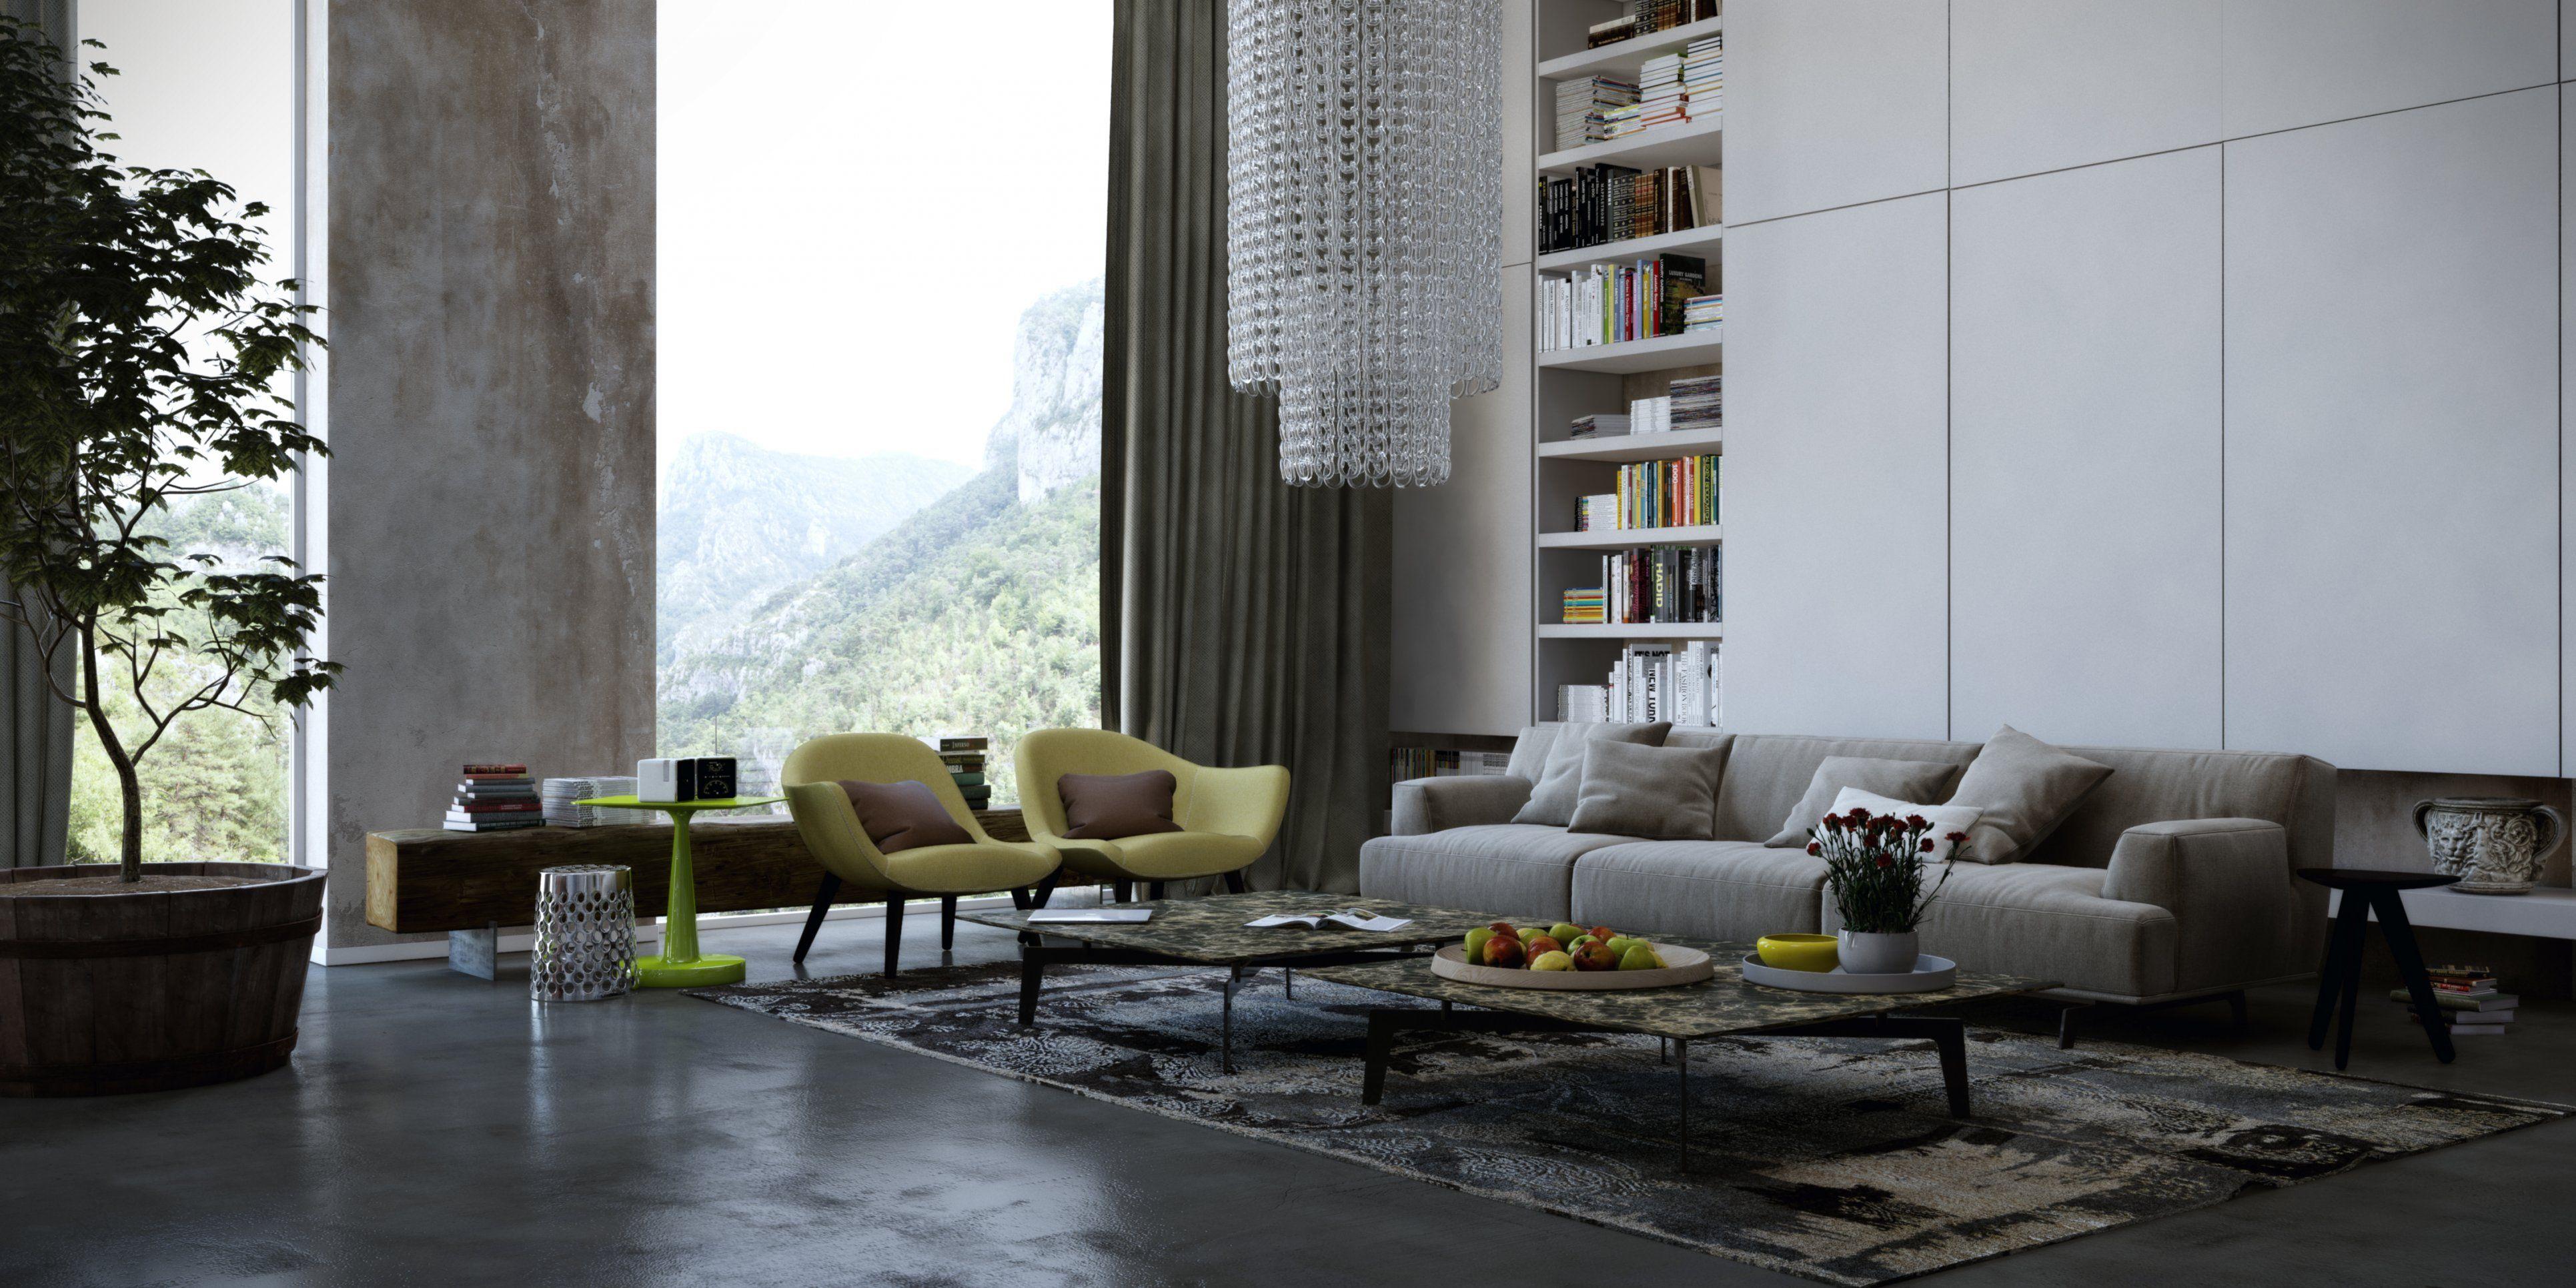 Sal n moderno miriam high ceiling living room living for Decoracion interiores salones